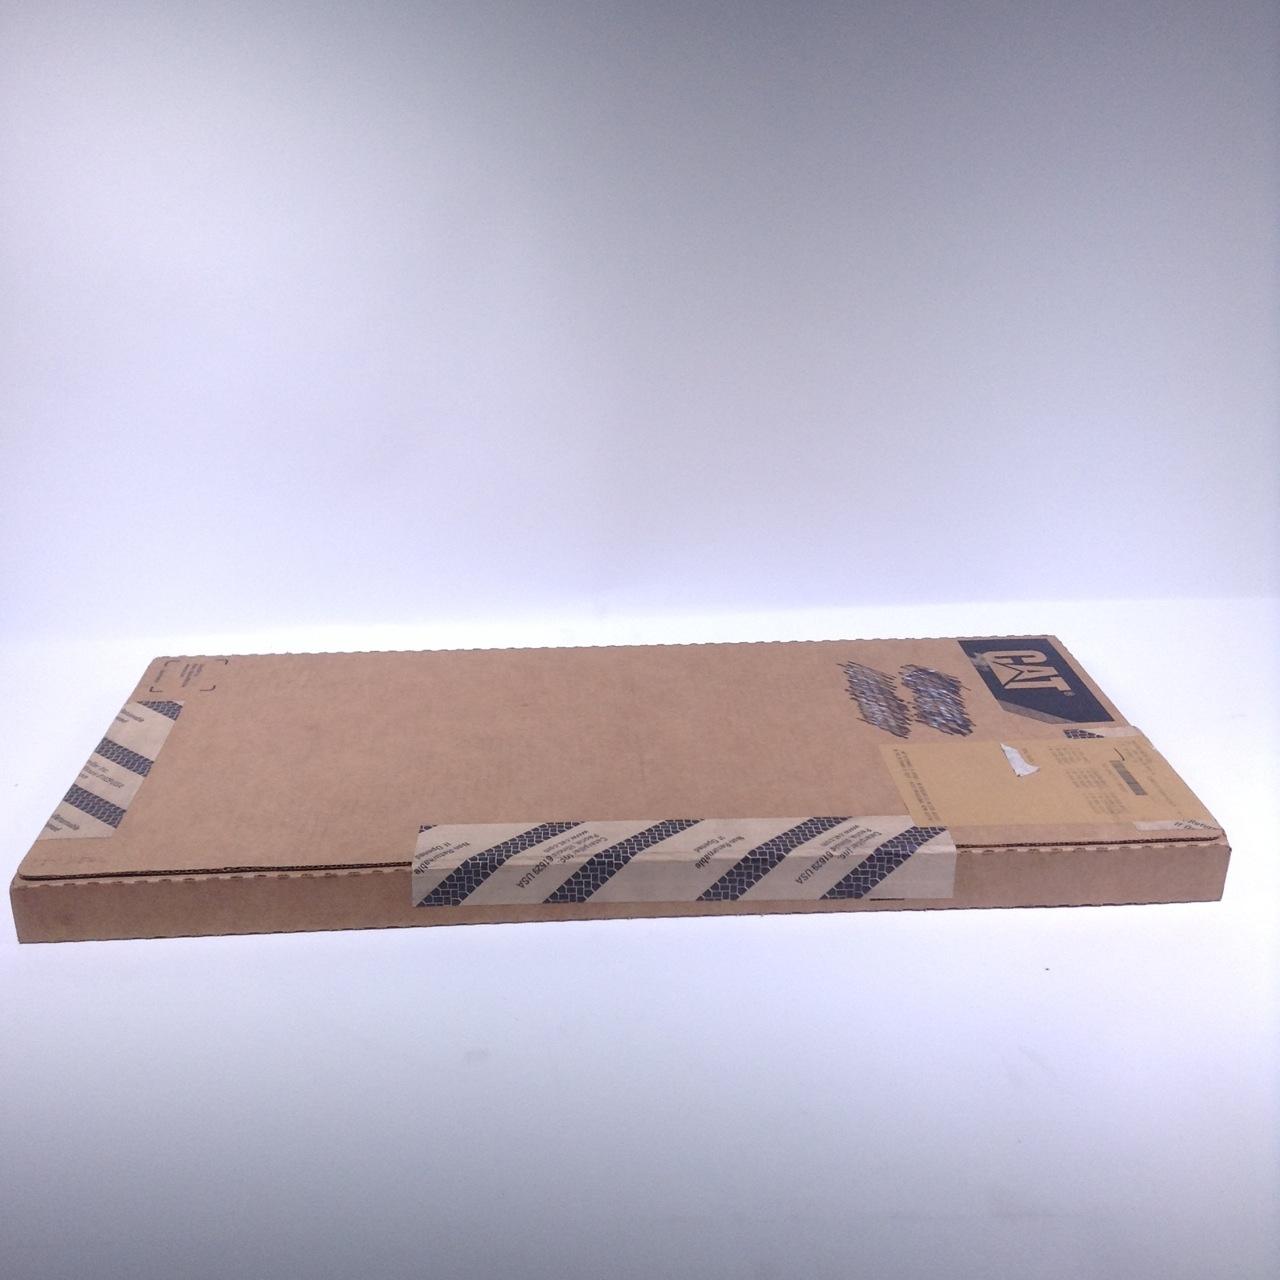 Caterpillar 391-8229 Gasket Kit FS New Factory Packing